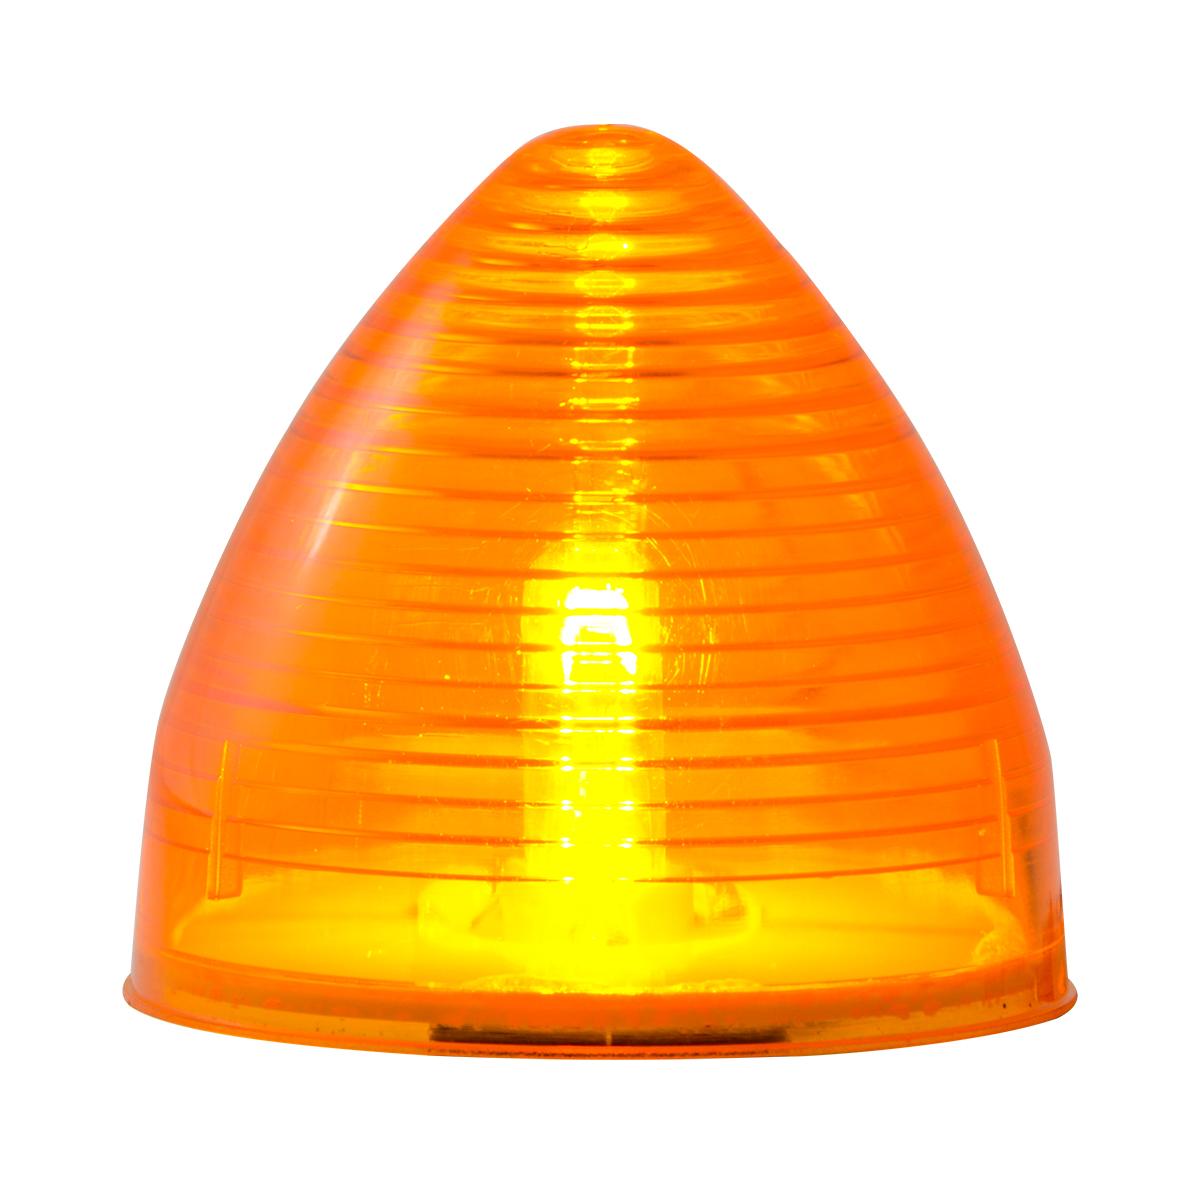 "#82830 2 ½"" Incandescent Beehive Amber/Amber Light"